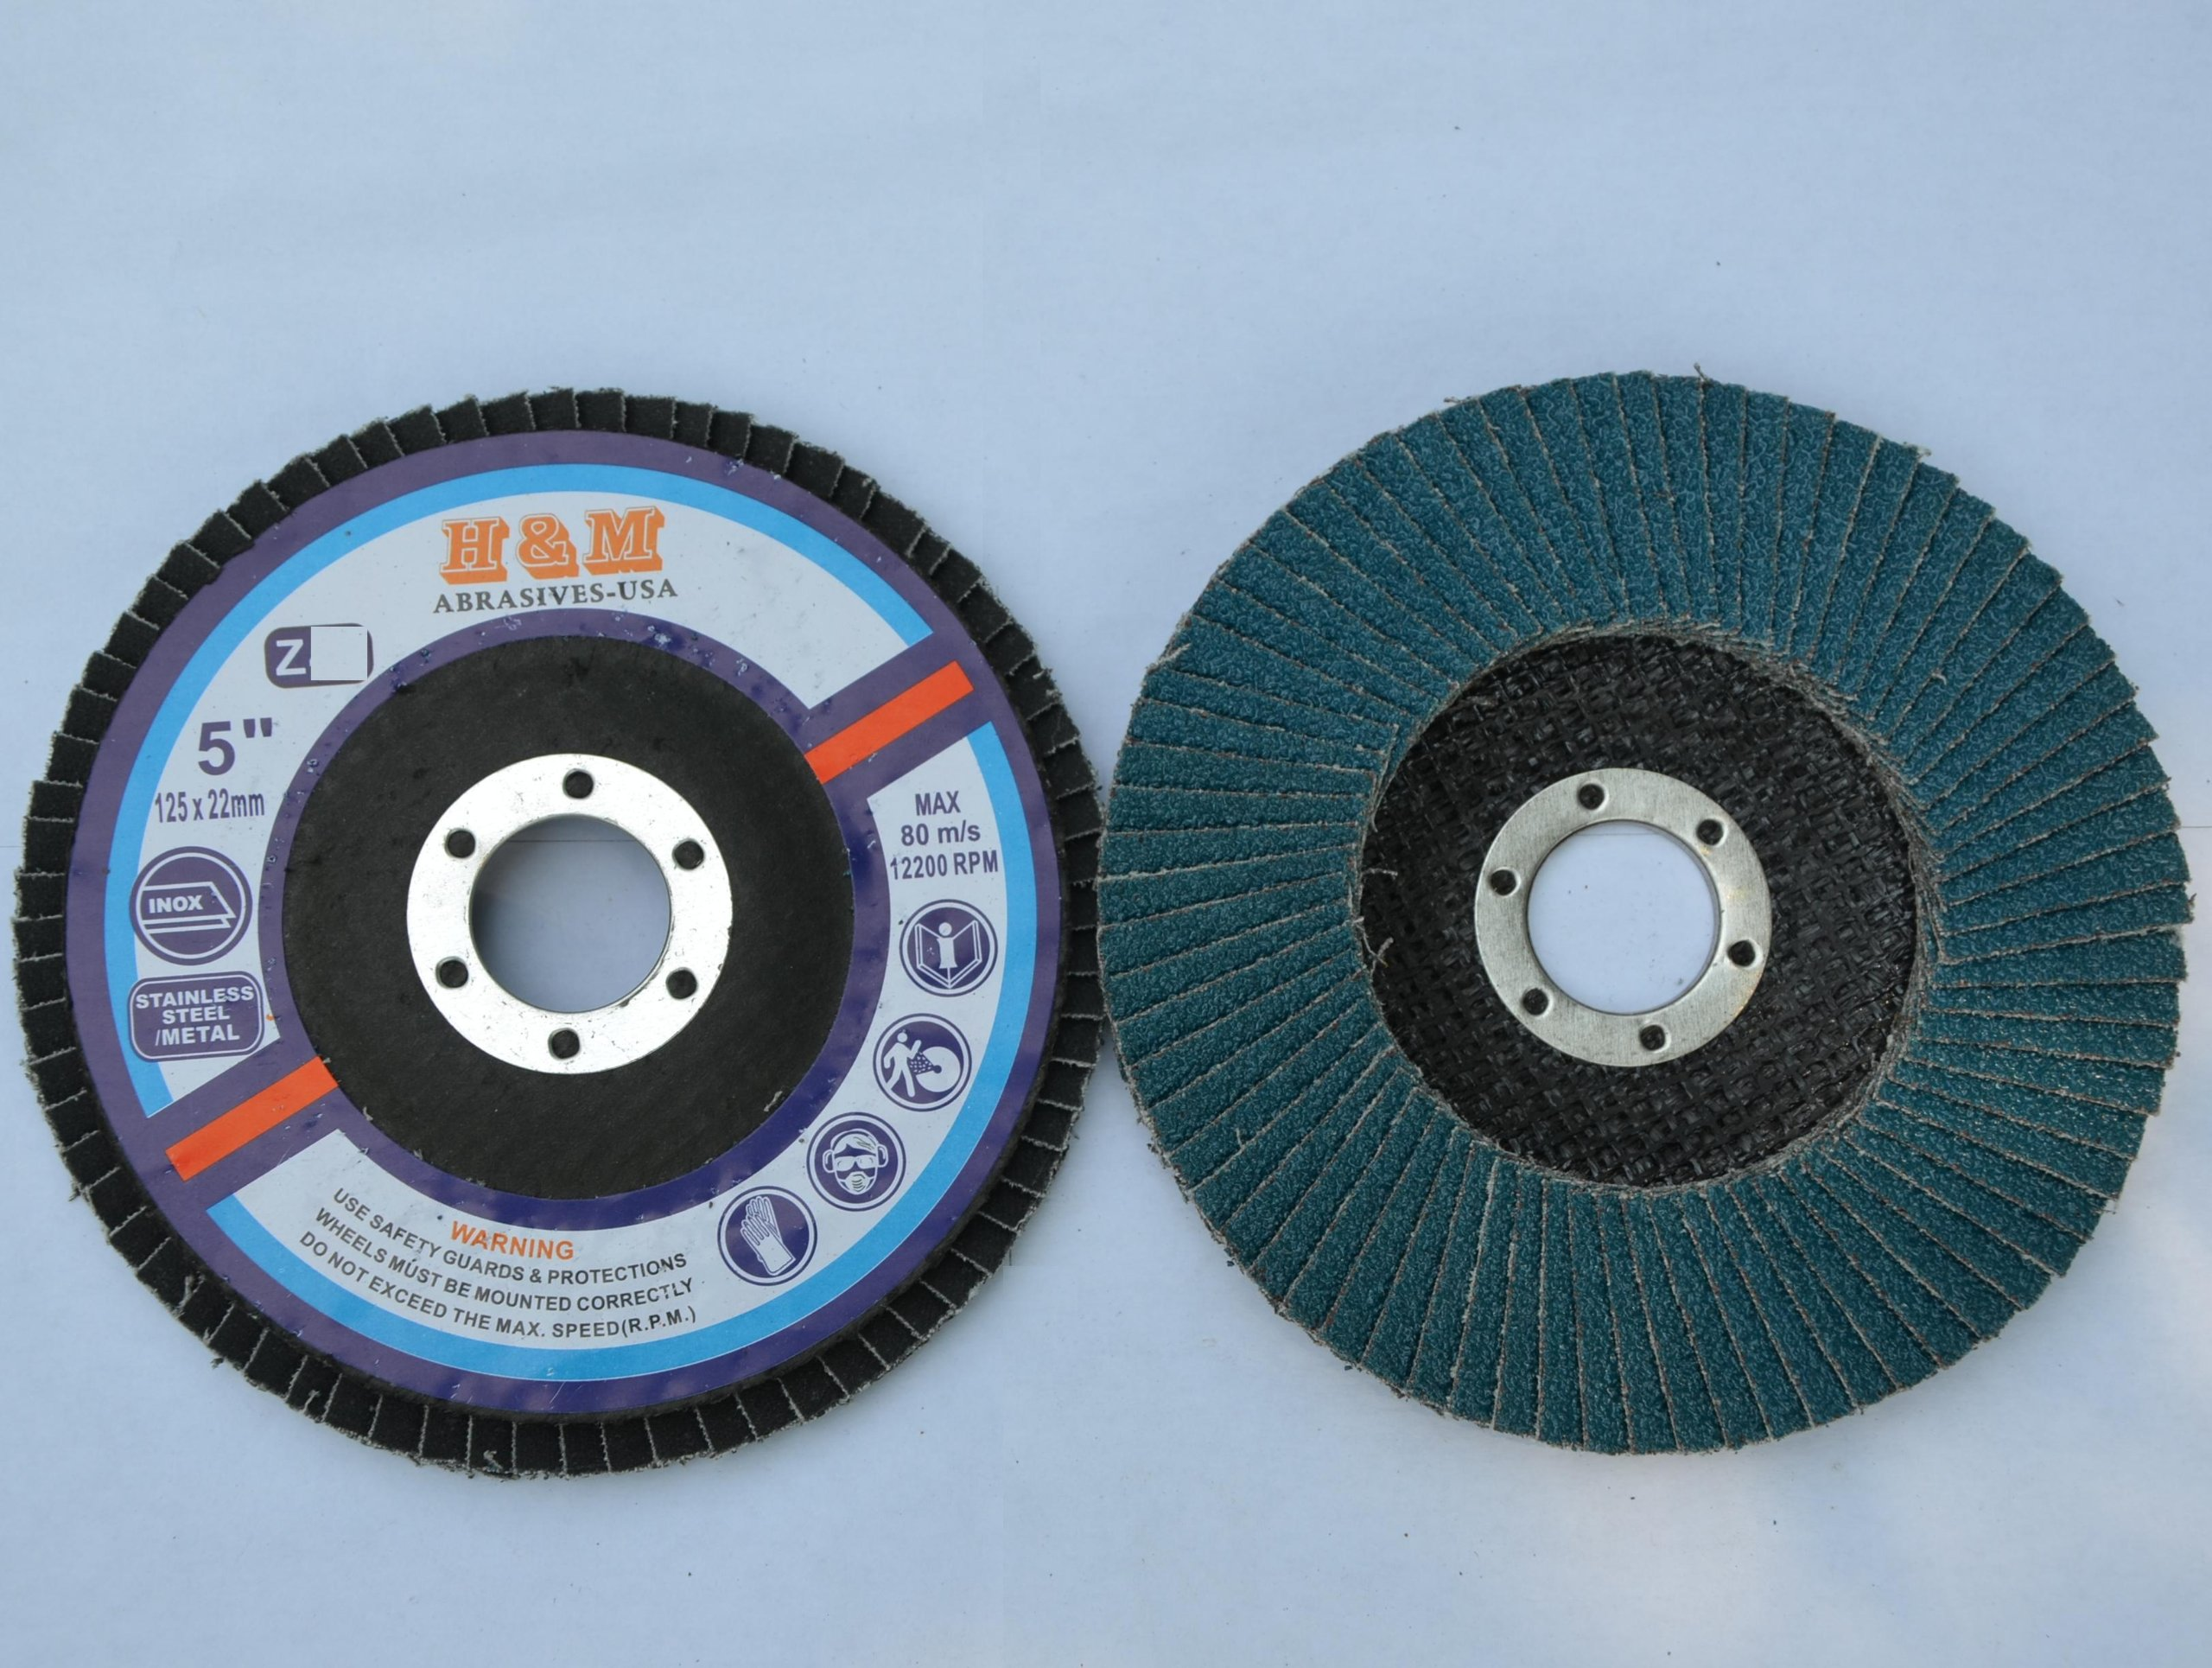 10pcs Premium FLAP DISCS 5'' x 7/8'' Zirconia 40 grit Grinding Wheel  grinder tool